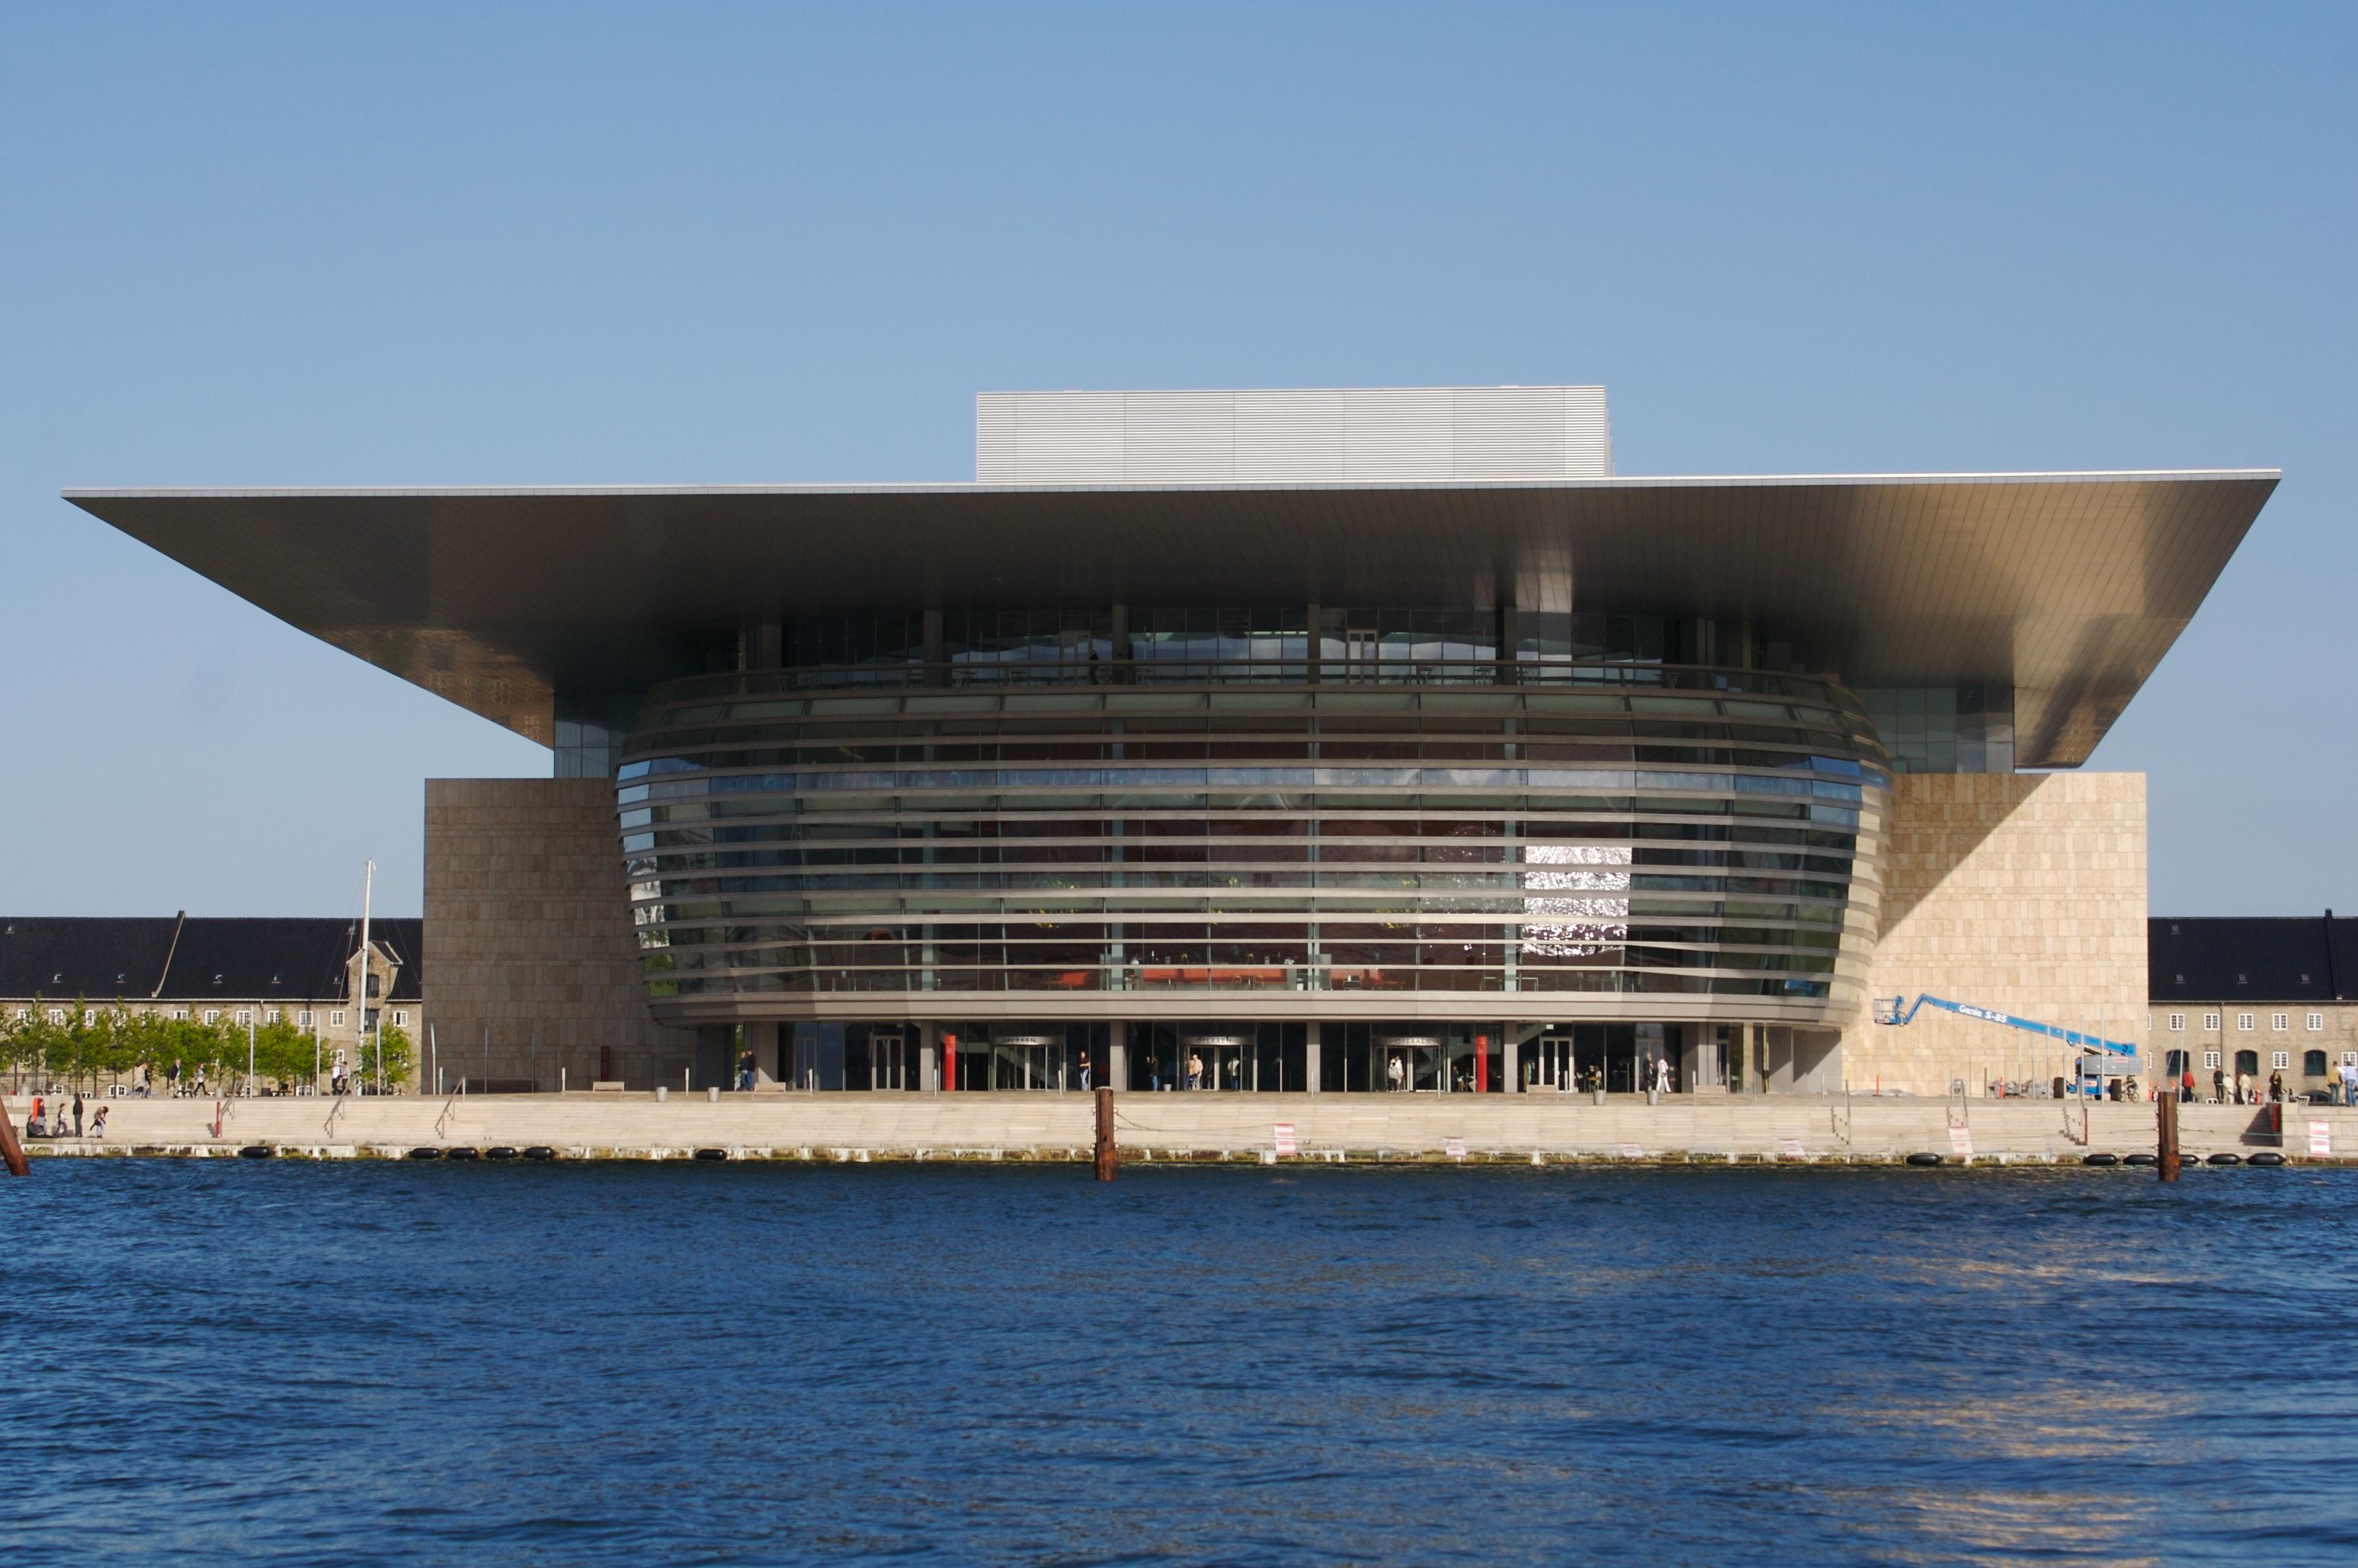 File:Copenhagen Opera House - front view.jpg - Wikipedia, the free ...